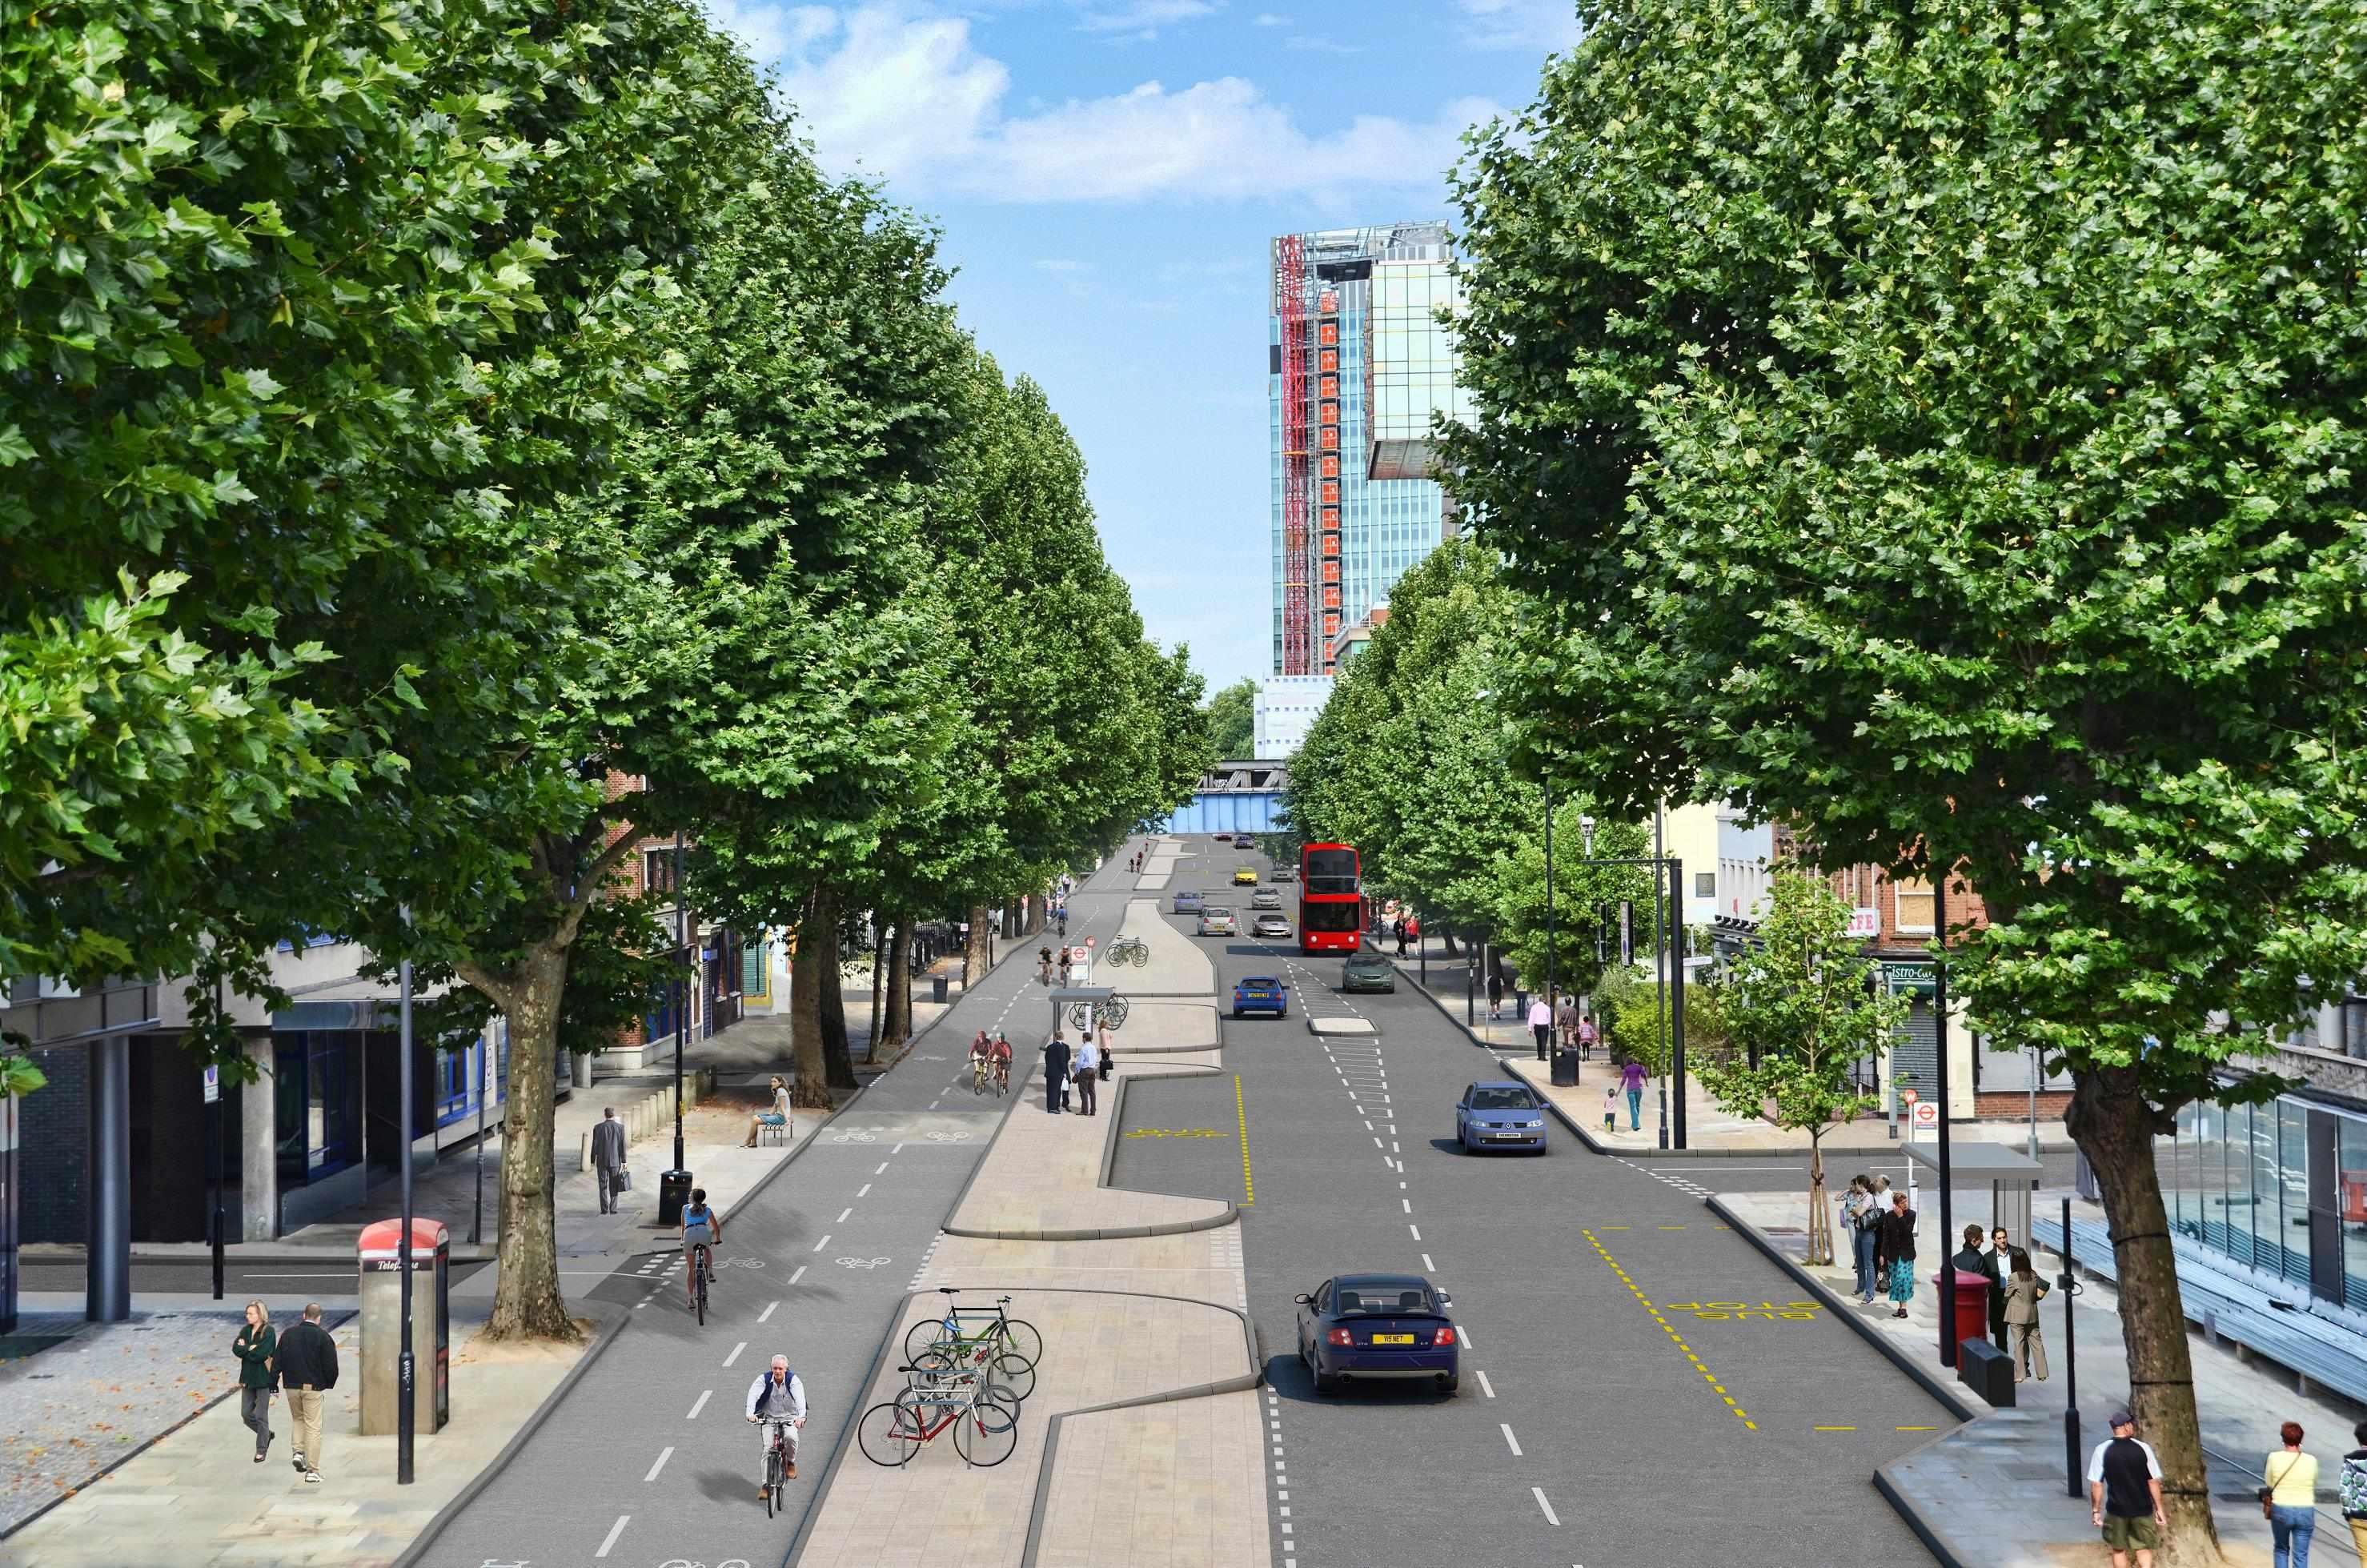 Virtual interpretation of Blackfriars Road, part of the London Cycle Superhighway